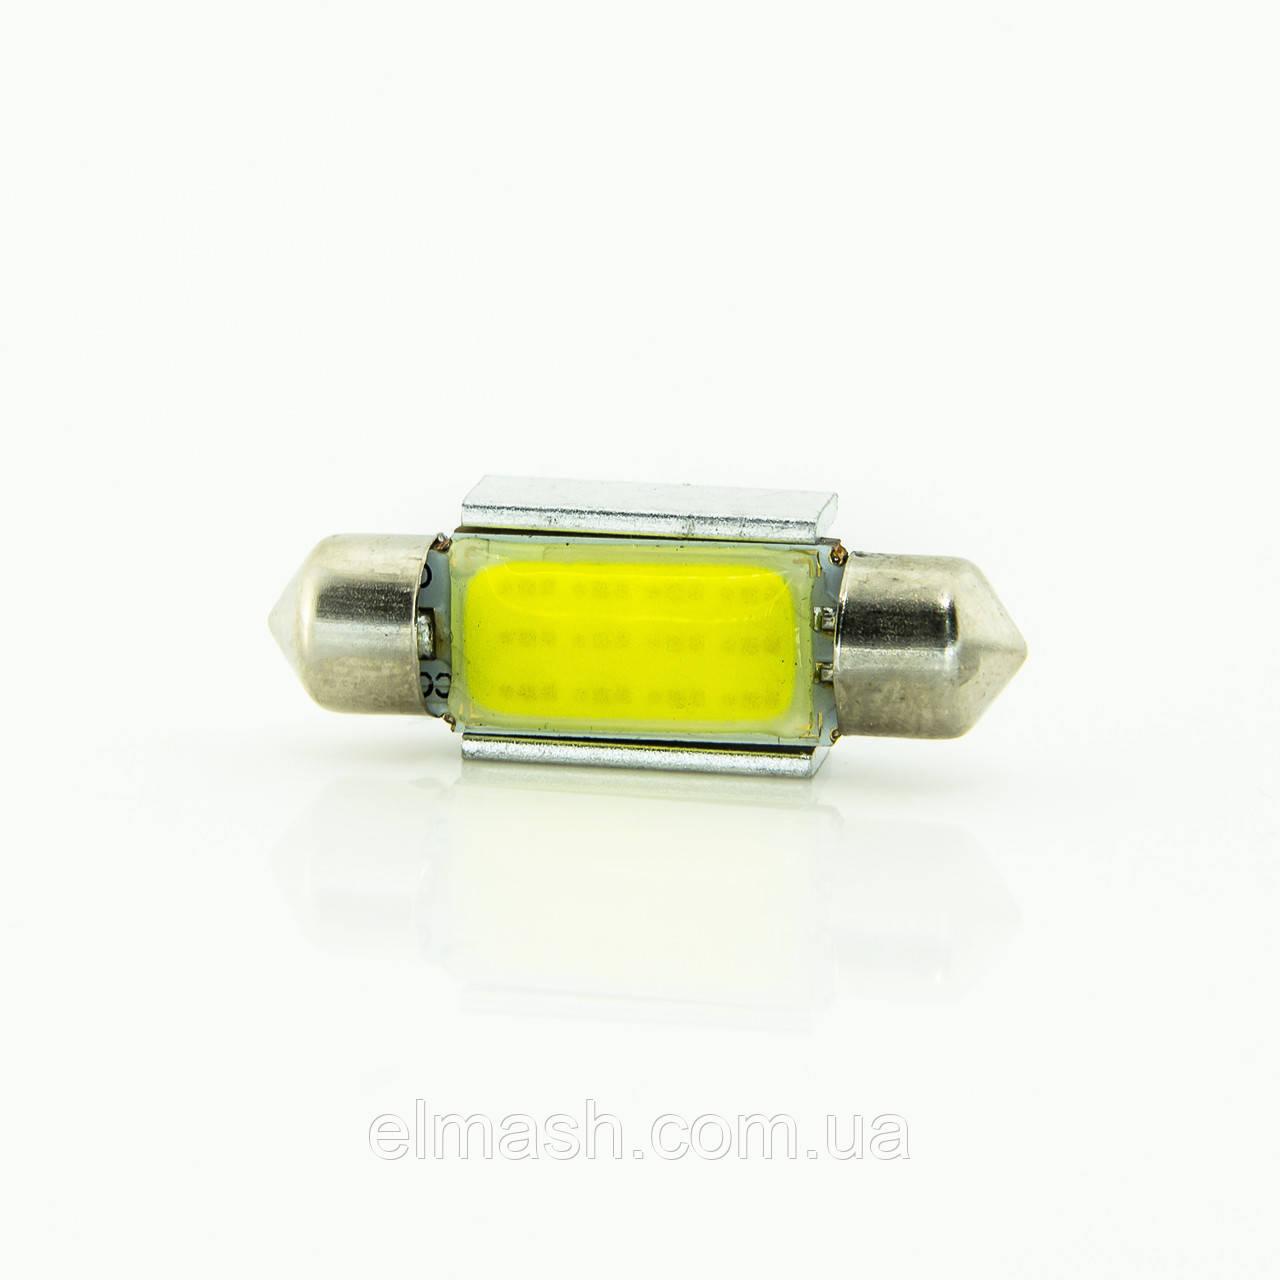 Лампа LED 12V АС (C5W) 12LED COB 36mm обманка 75Lm БЕЛЫЙ